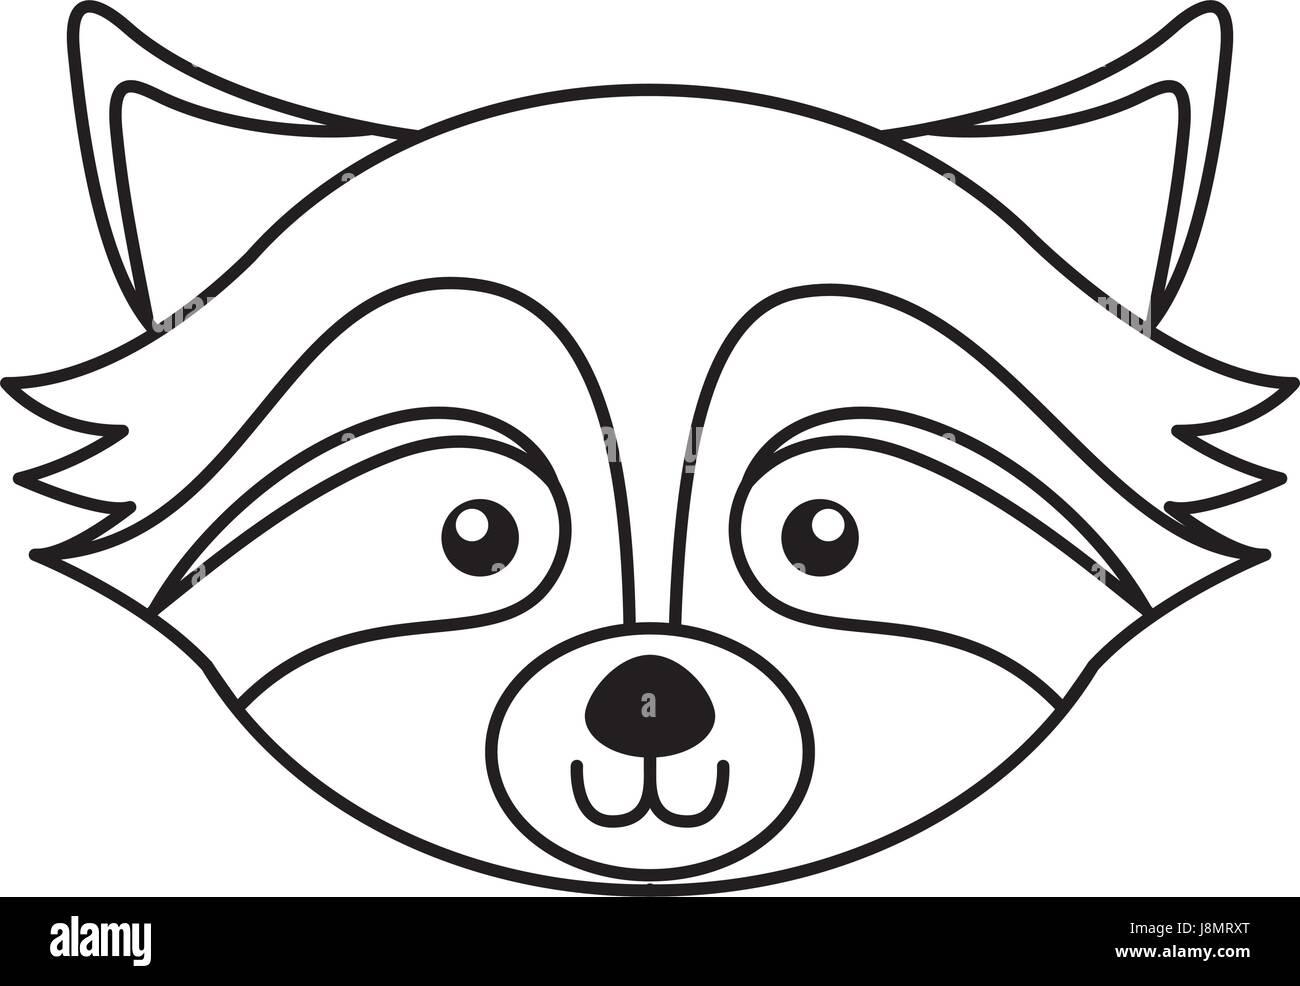 Line Drawing Raccoon : Cute raccoon face cartoon stock vector art illustration